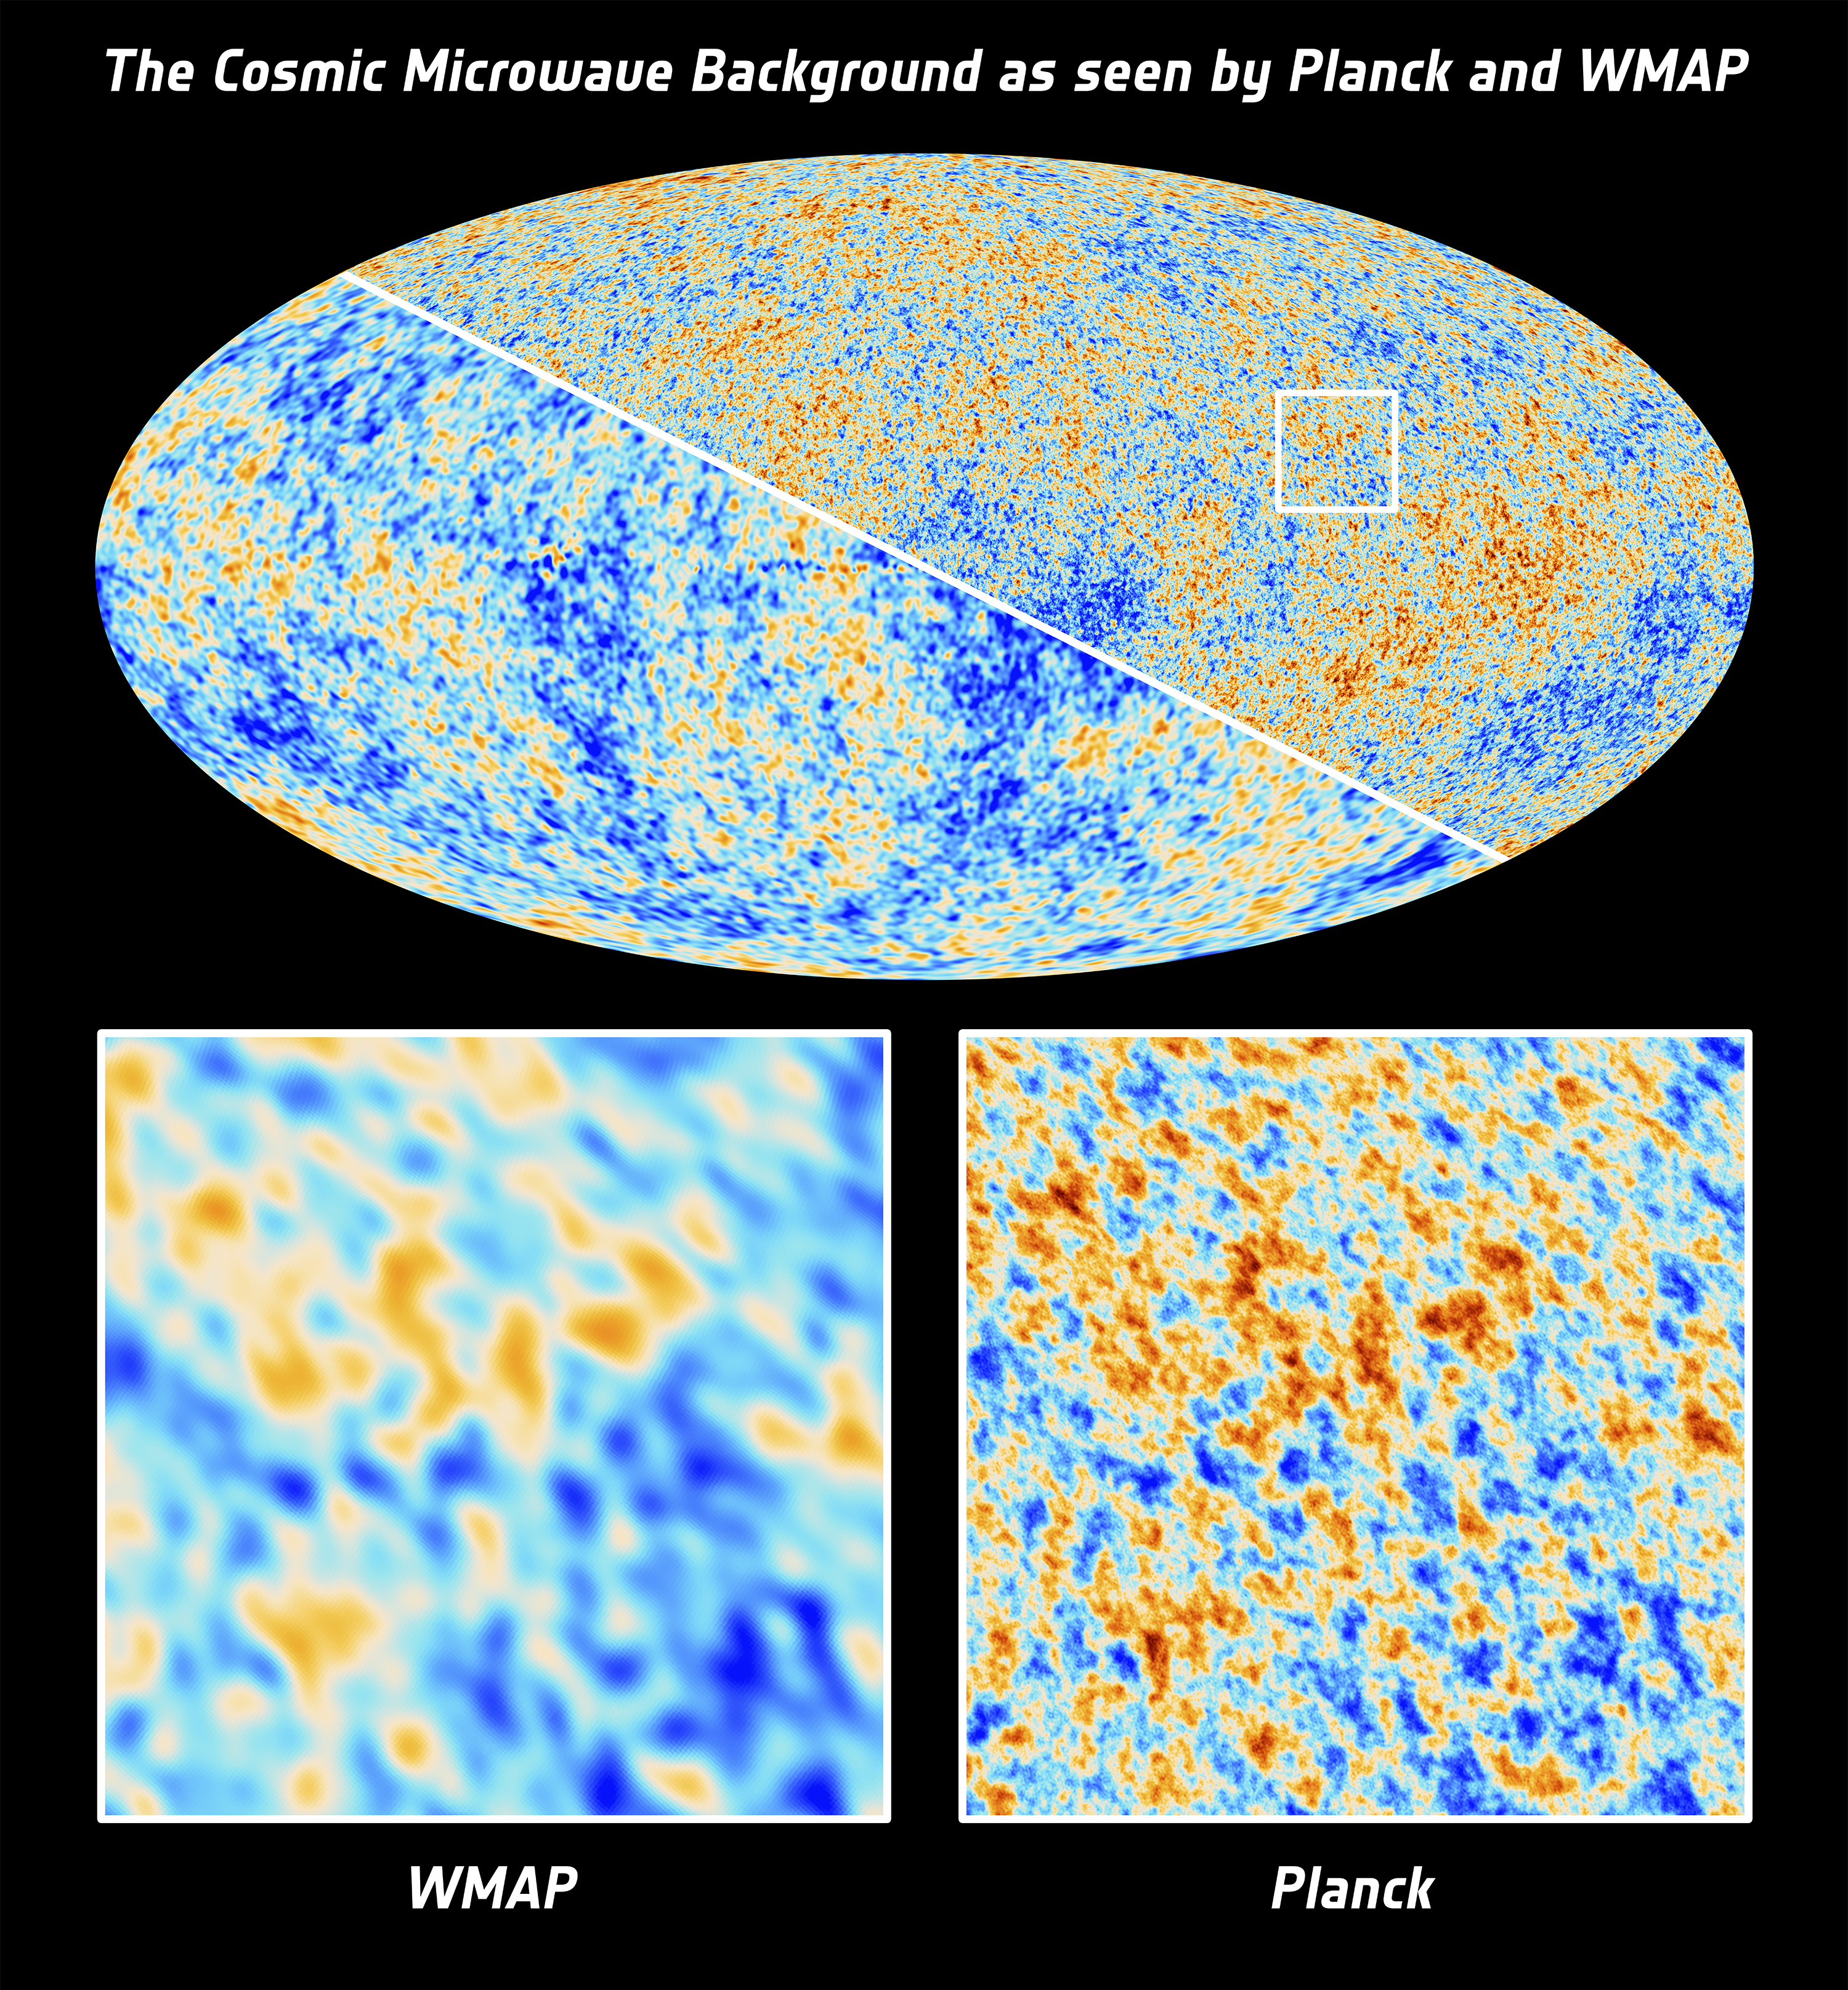 http://sci.esa.int/science-e-media/img/62/Compo_CMB_Planck_WMAP_v1_3k.jpg